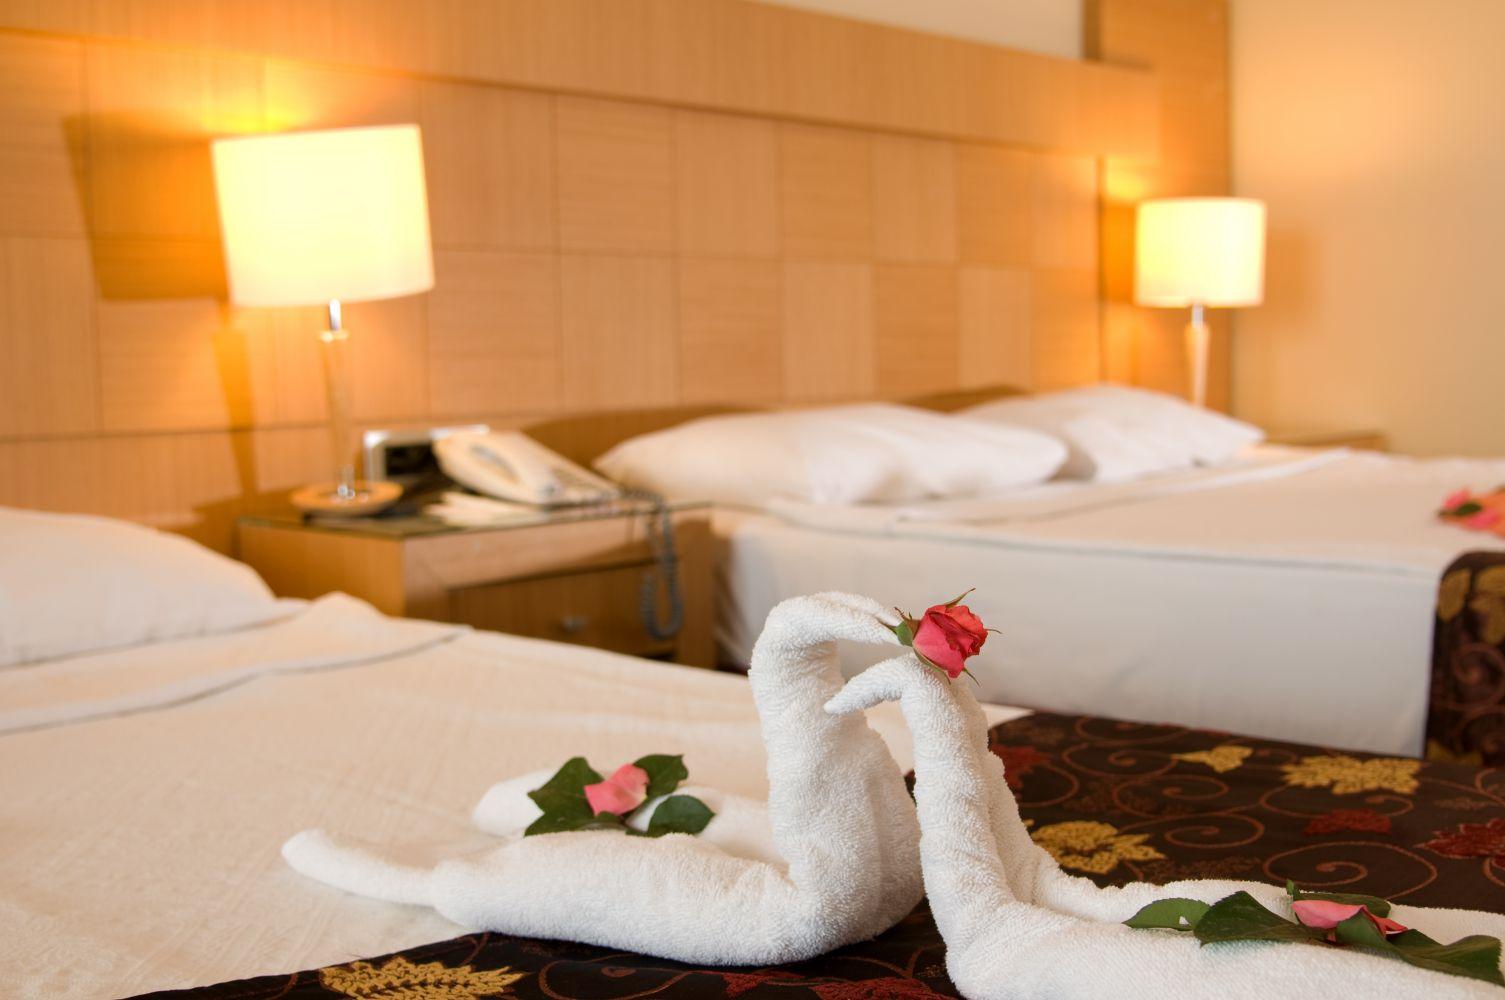 Beautiful hotel room in Elko, NV